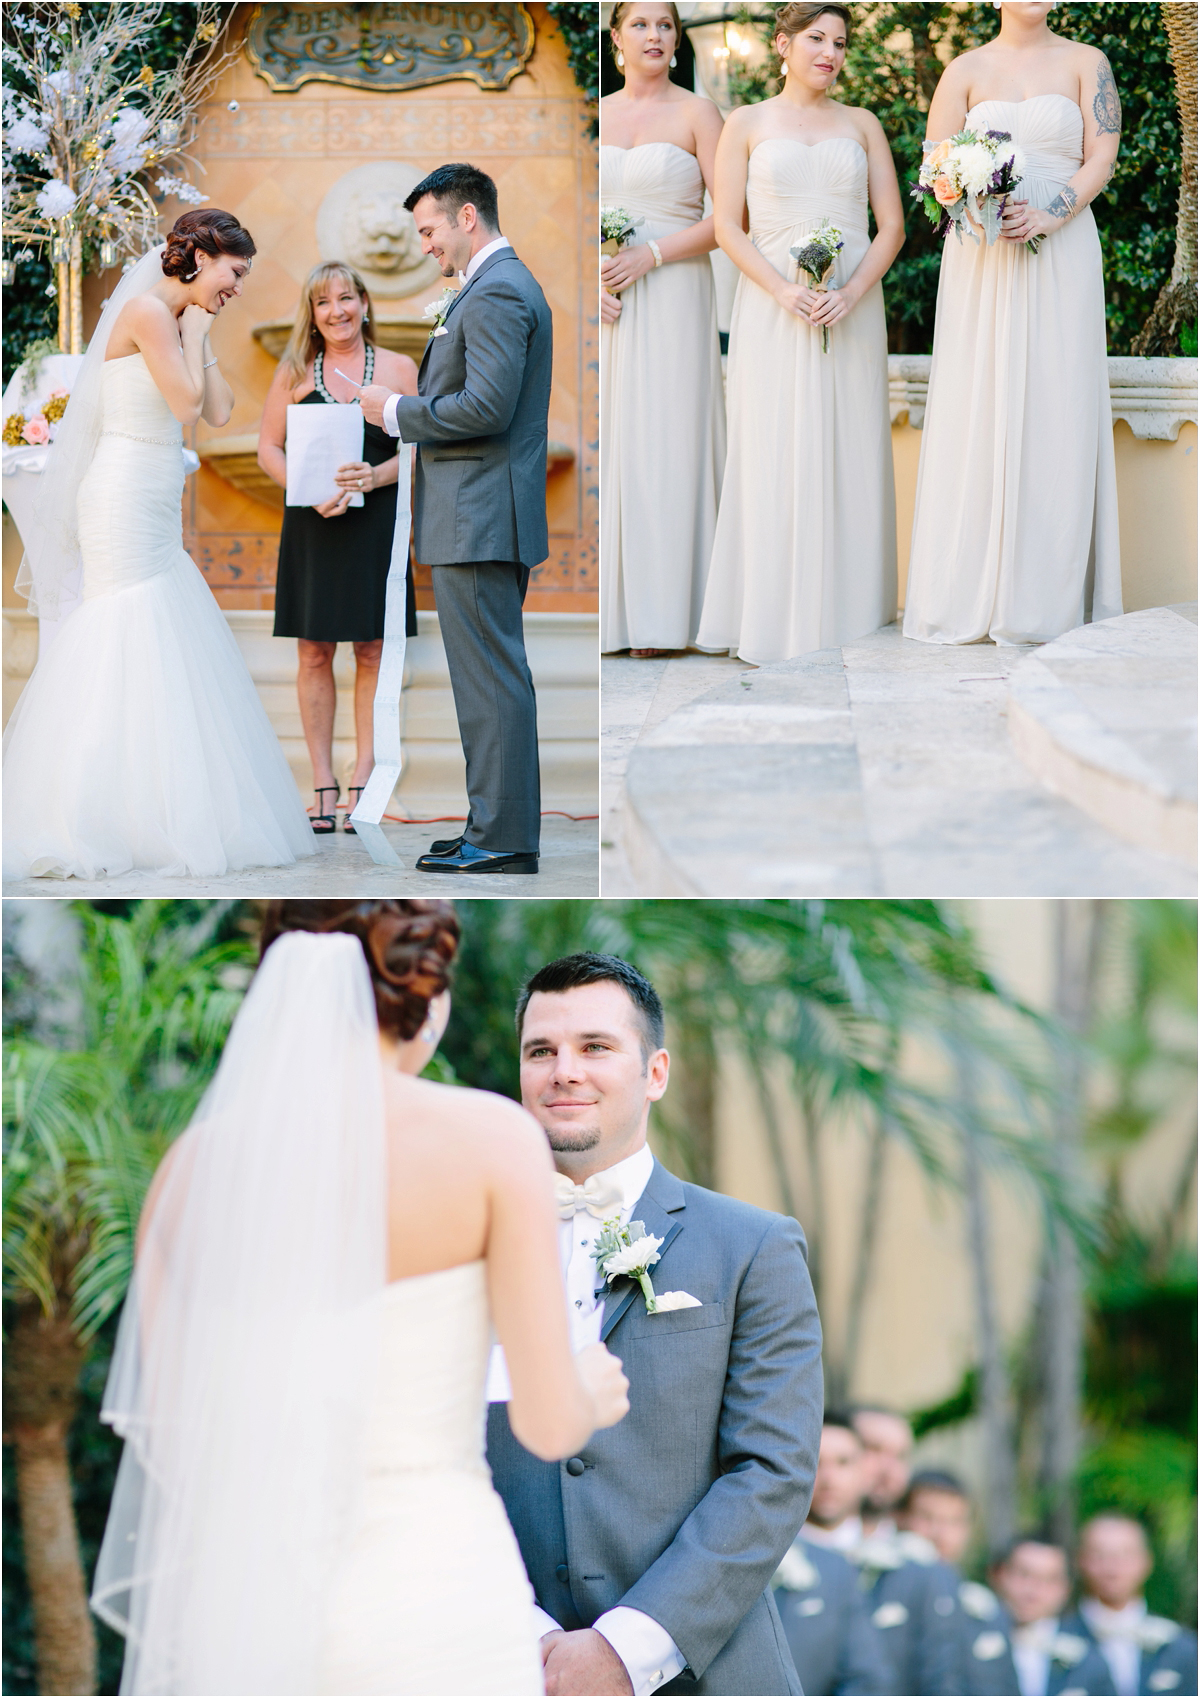 Palm_Beach_Eau_wedding_Photographer_0017